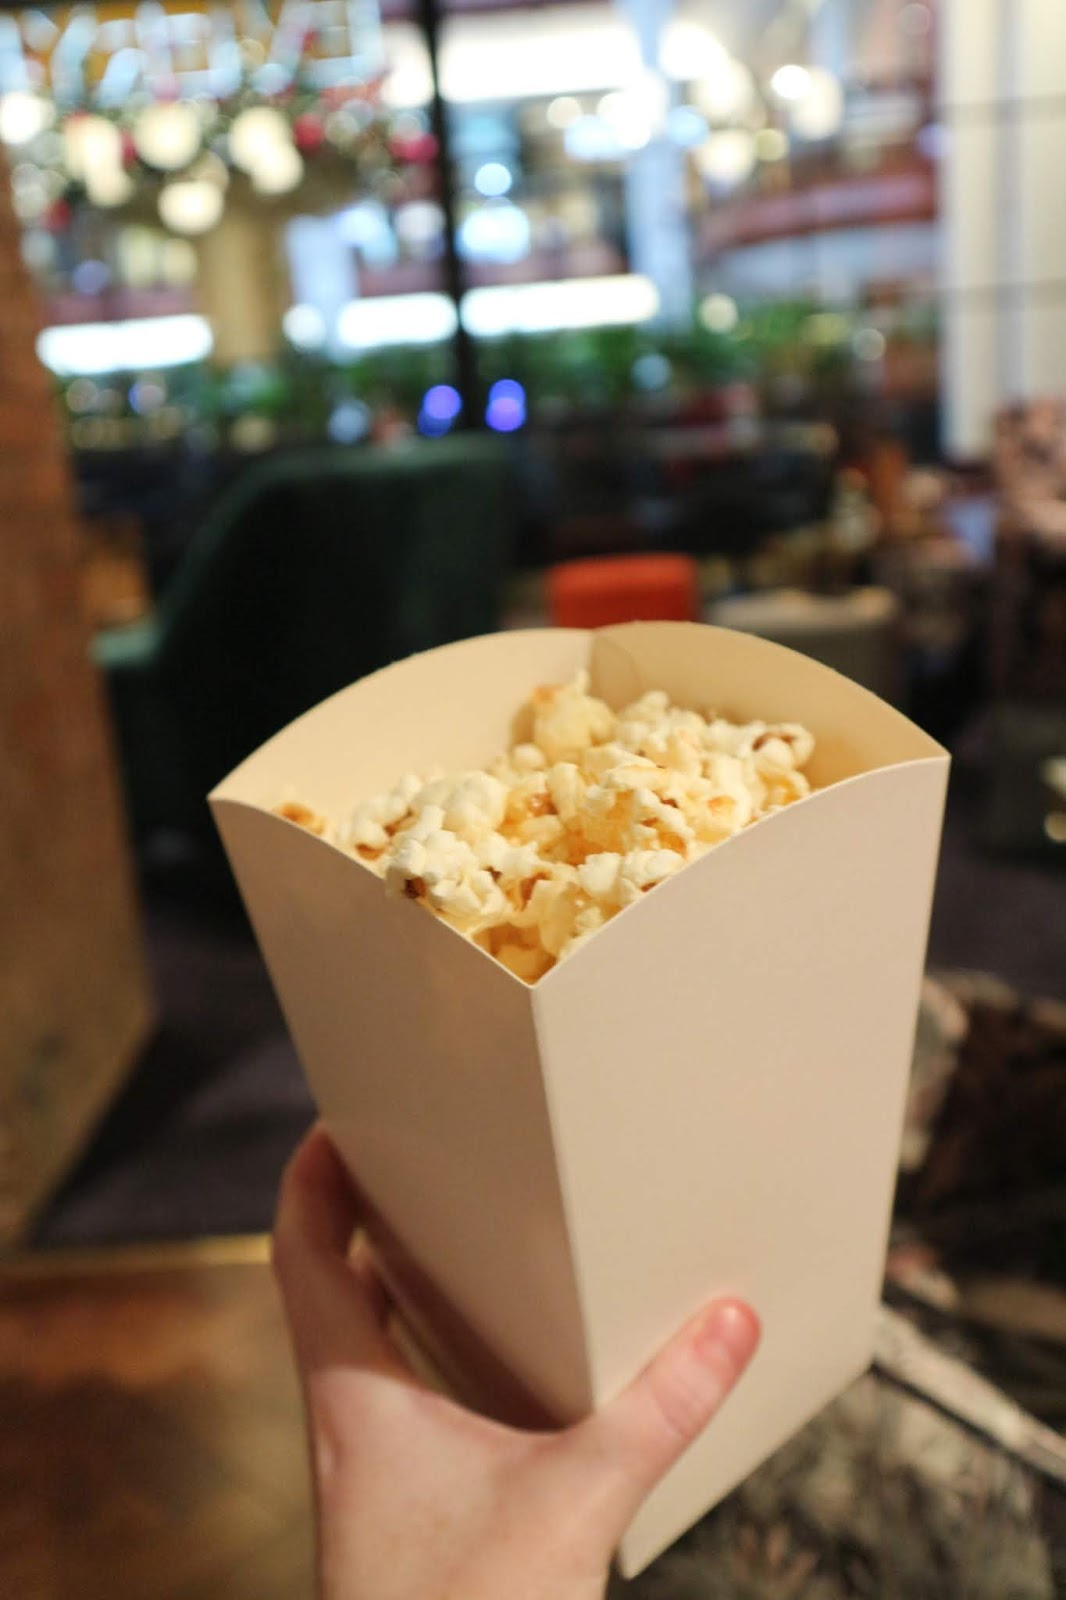 everyman cinema princes square